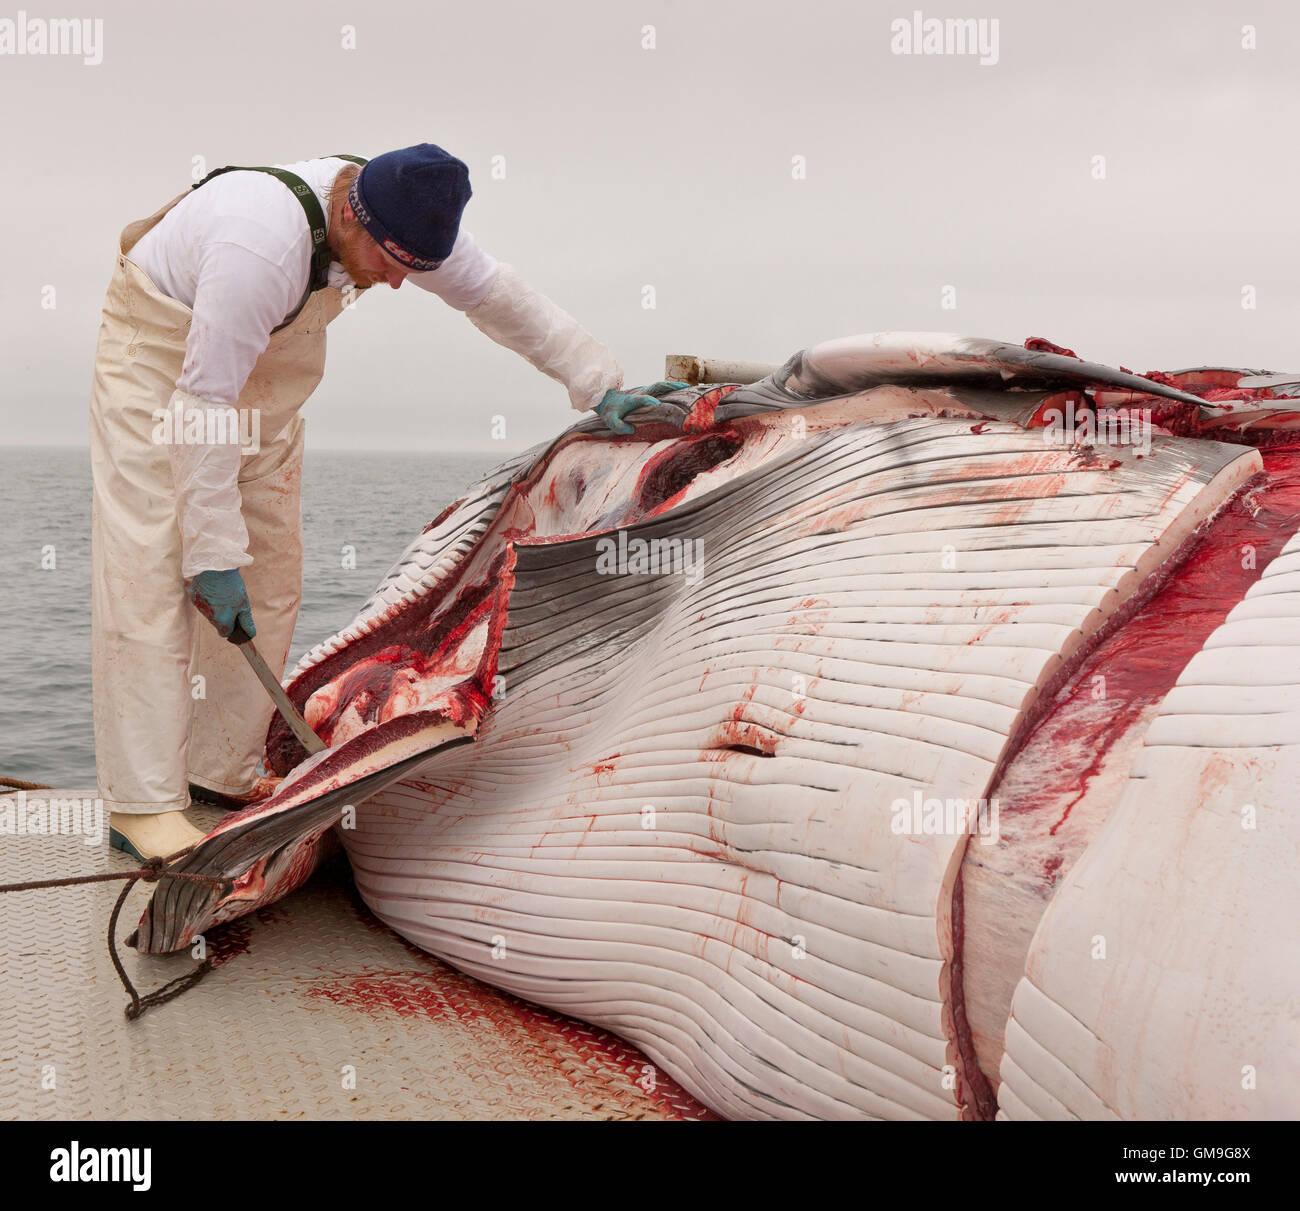 Minke Whale Hunt, fisherman scuoiatura la balena a bordo del Hrafnreydur KO-100, nave baleniera, Islanda Immagini Stock